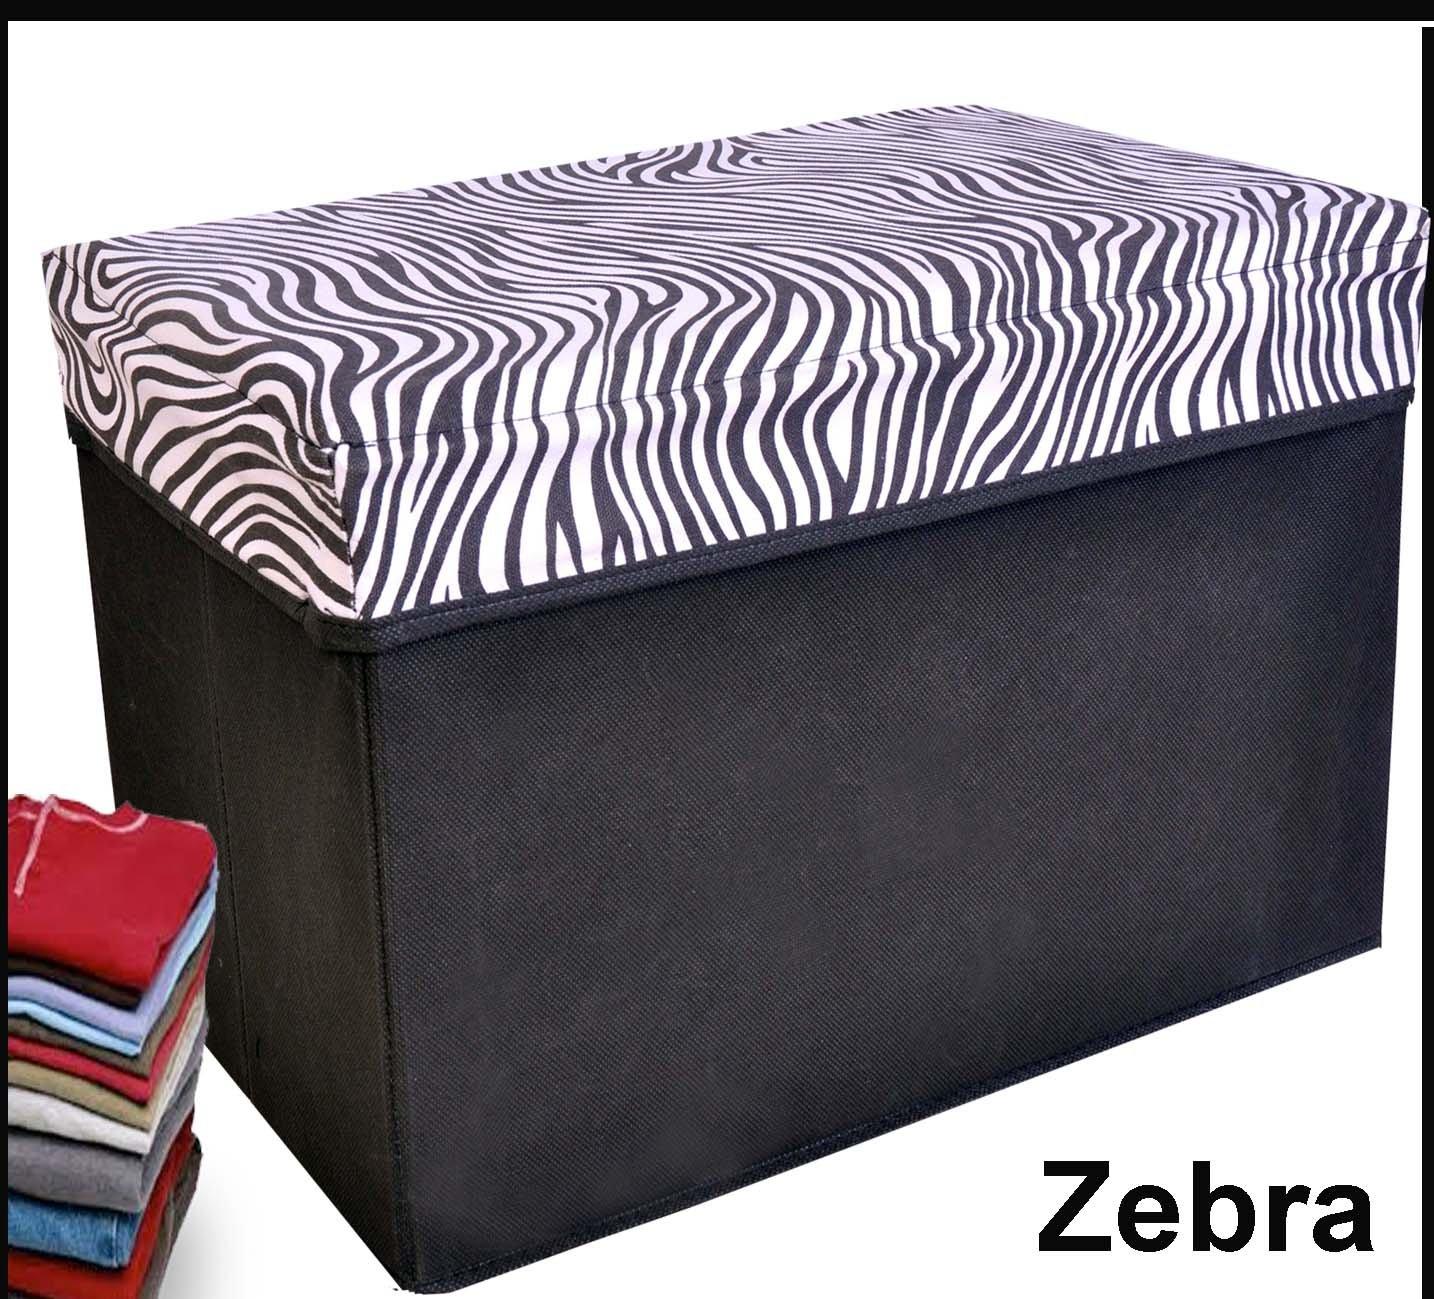 Marvelous Amazon.com: Collapsible Storage Ottoman, Rectangle Shape (Zebra Pattern):  Kitchen U0026 Dining